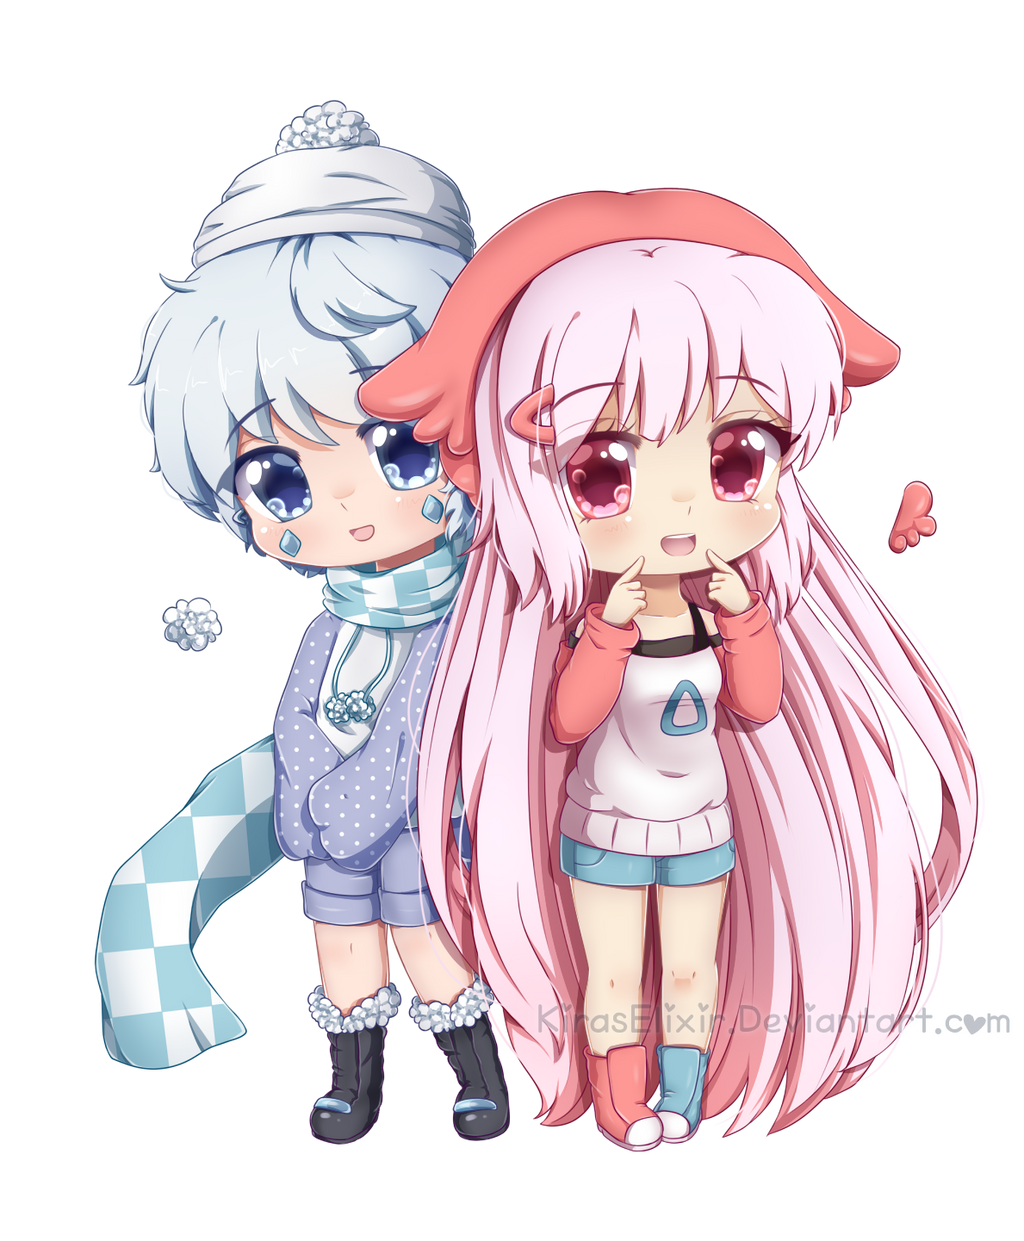 C: Marshmellohtea 01 by KirasElixir